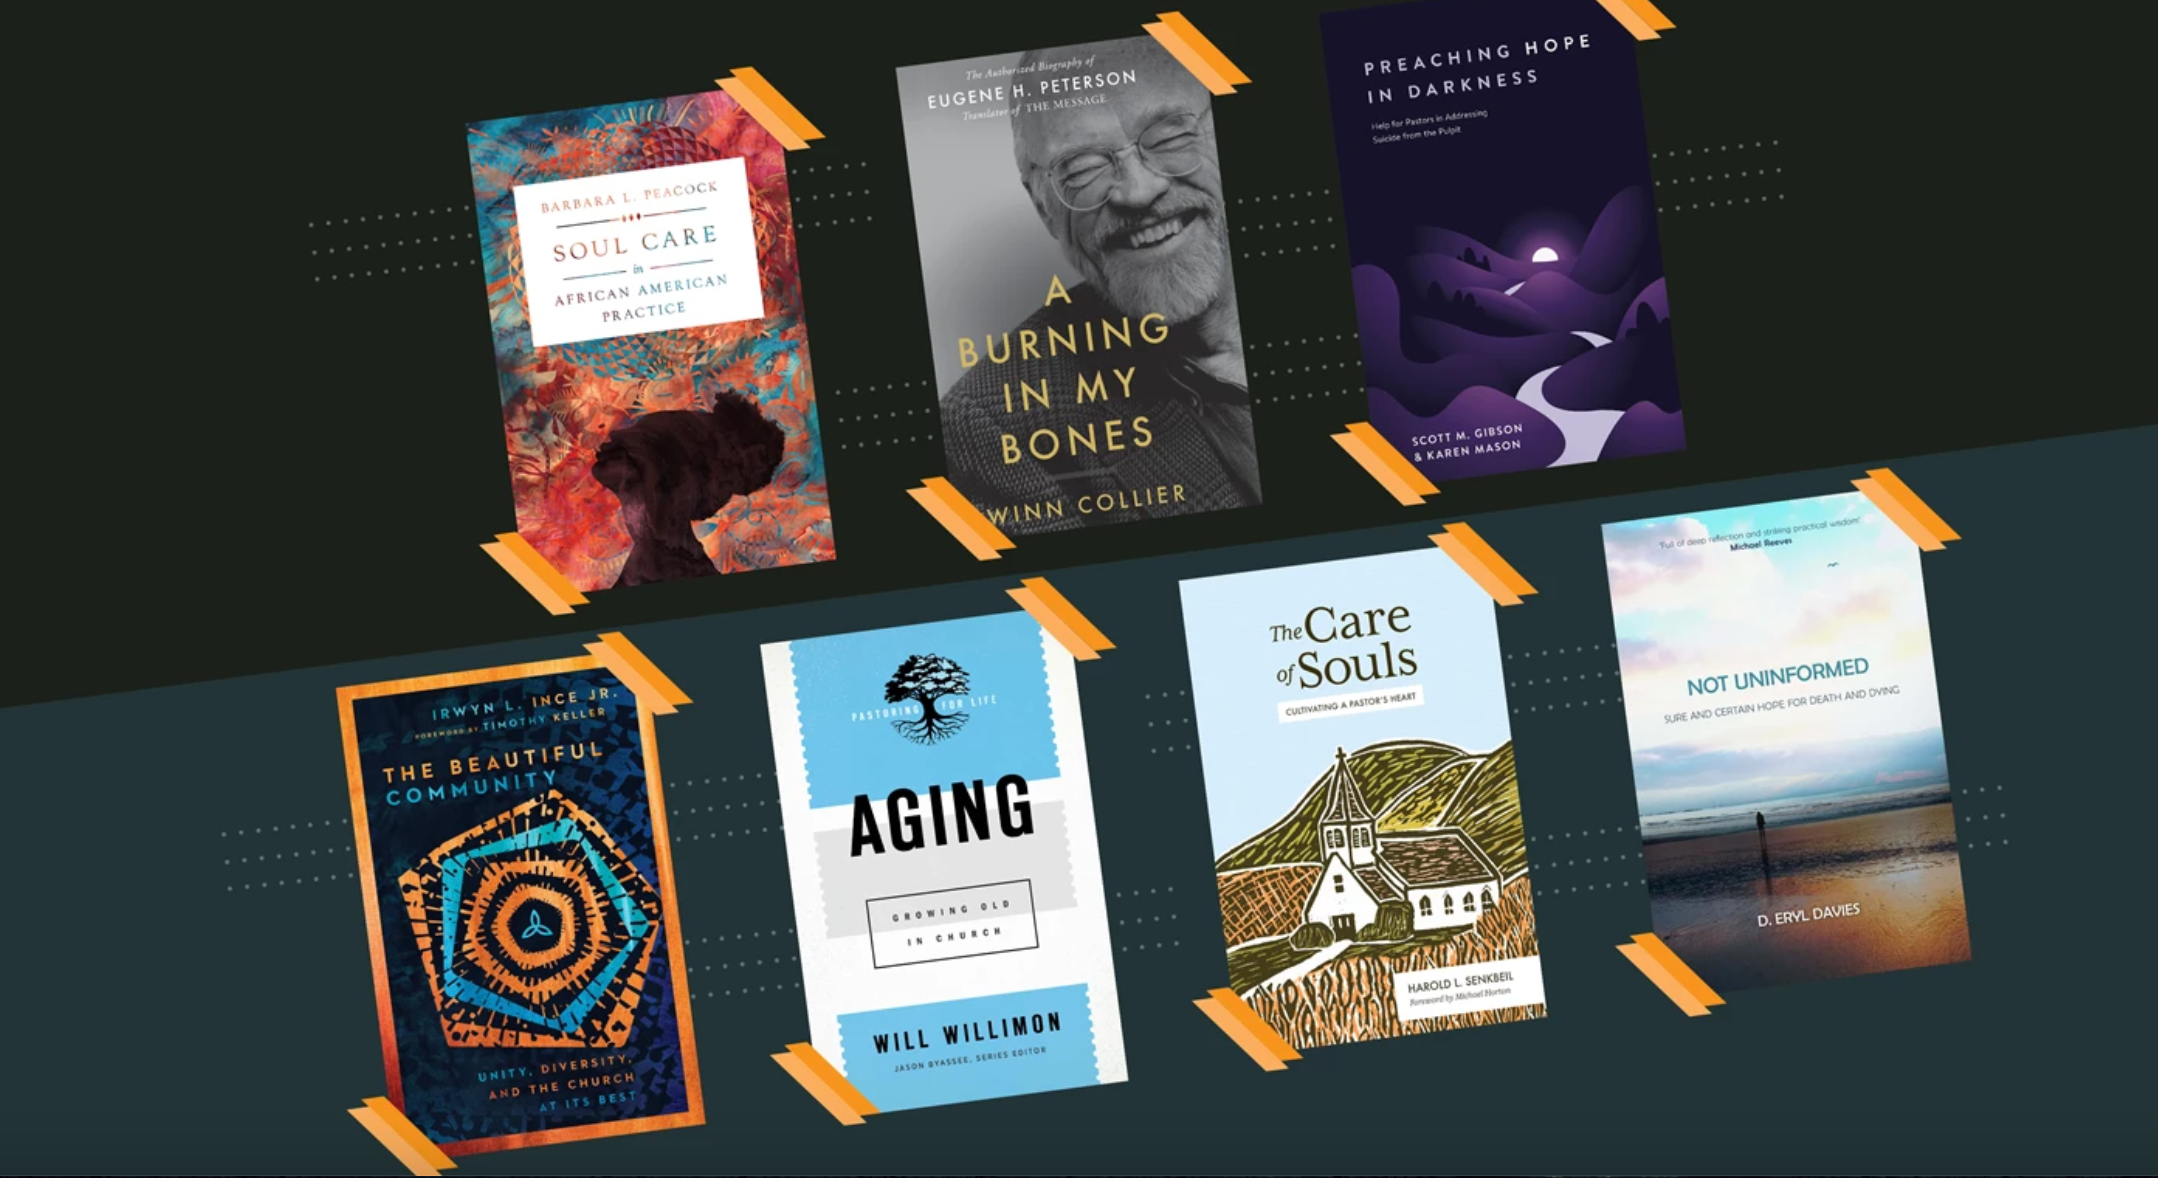 7 Books for Pastoral Care